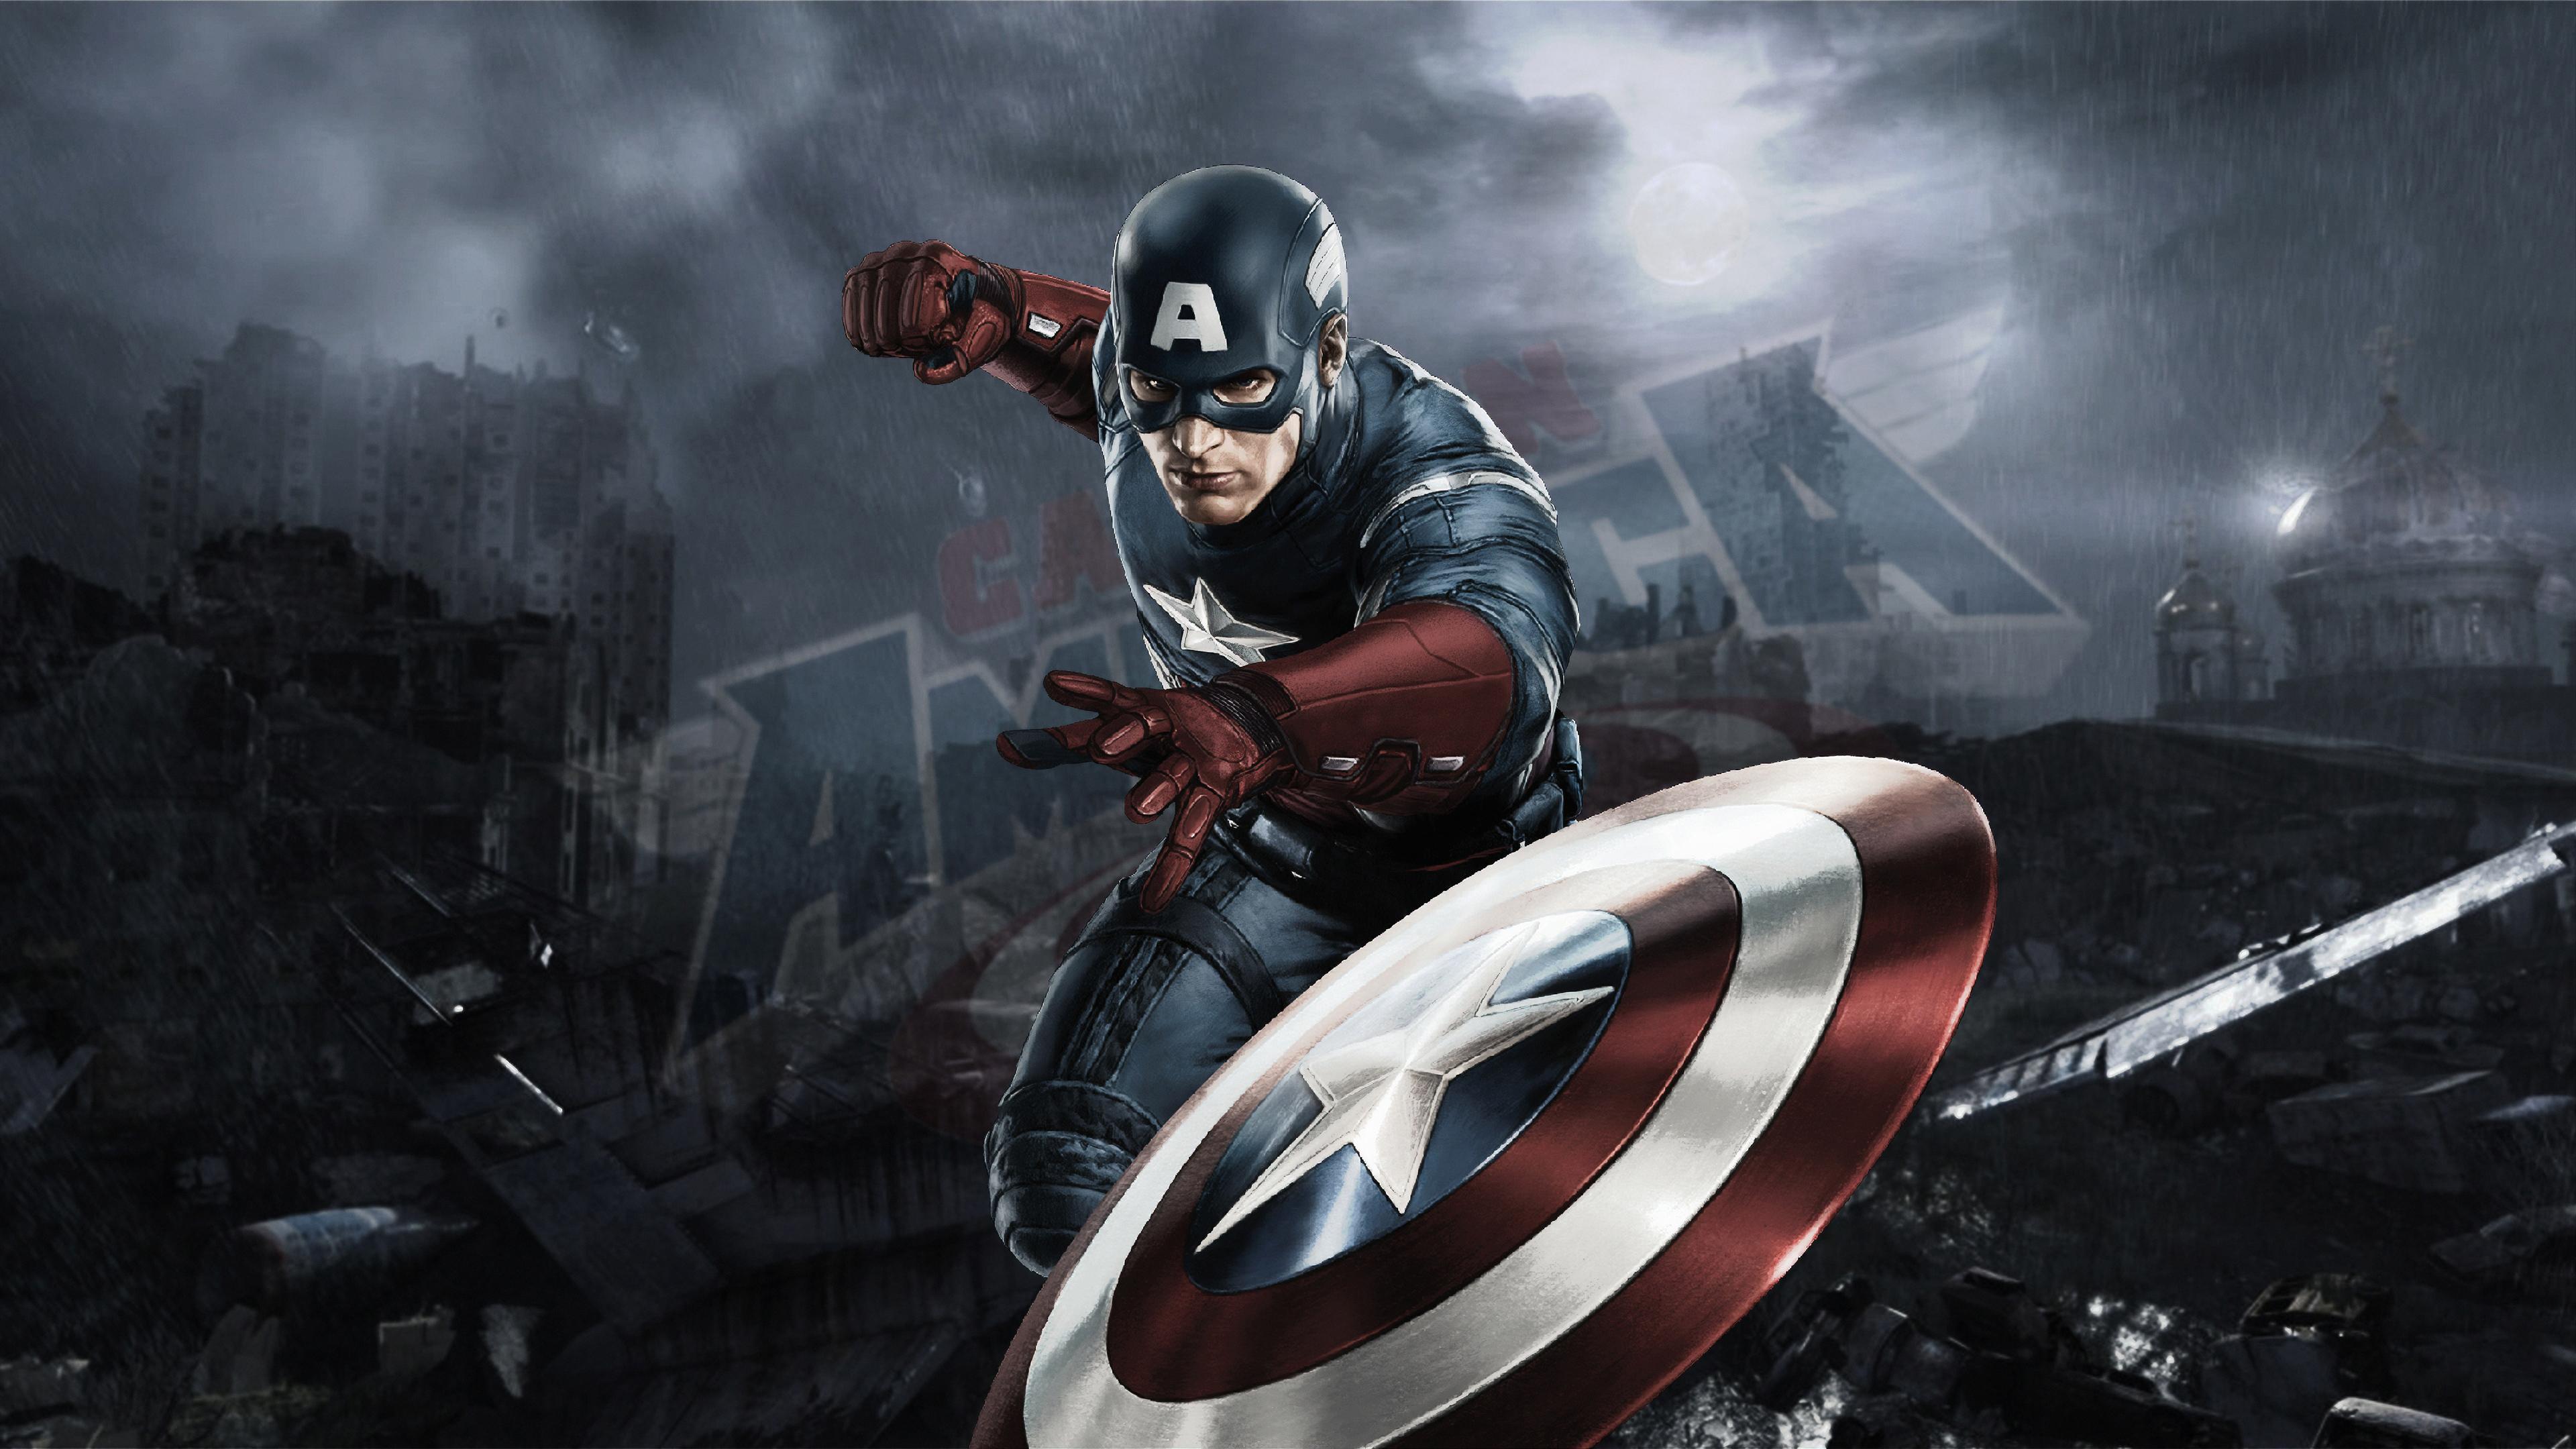 Captain America 4k Artworks, HD Superheroes, 4k Wallpapers ...